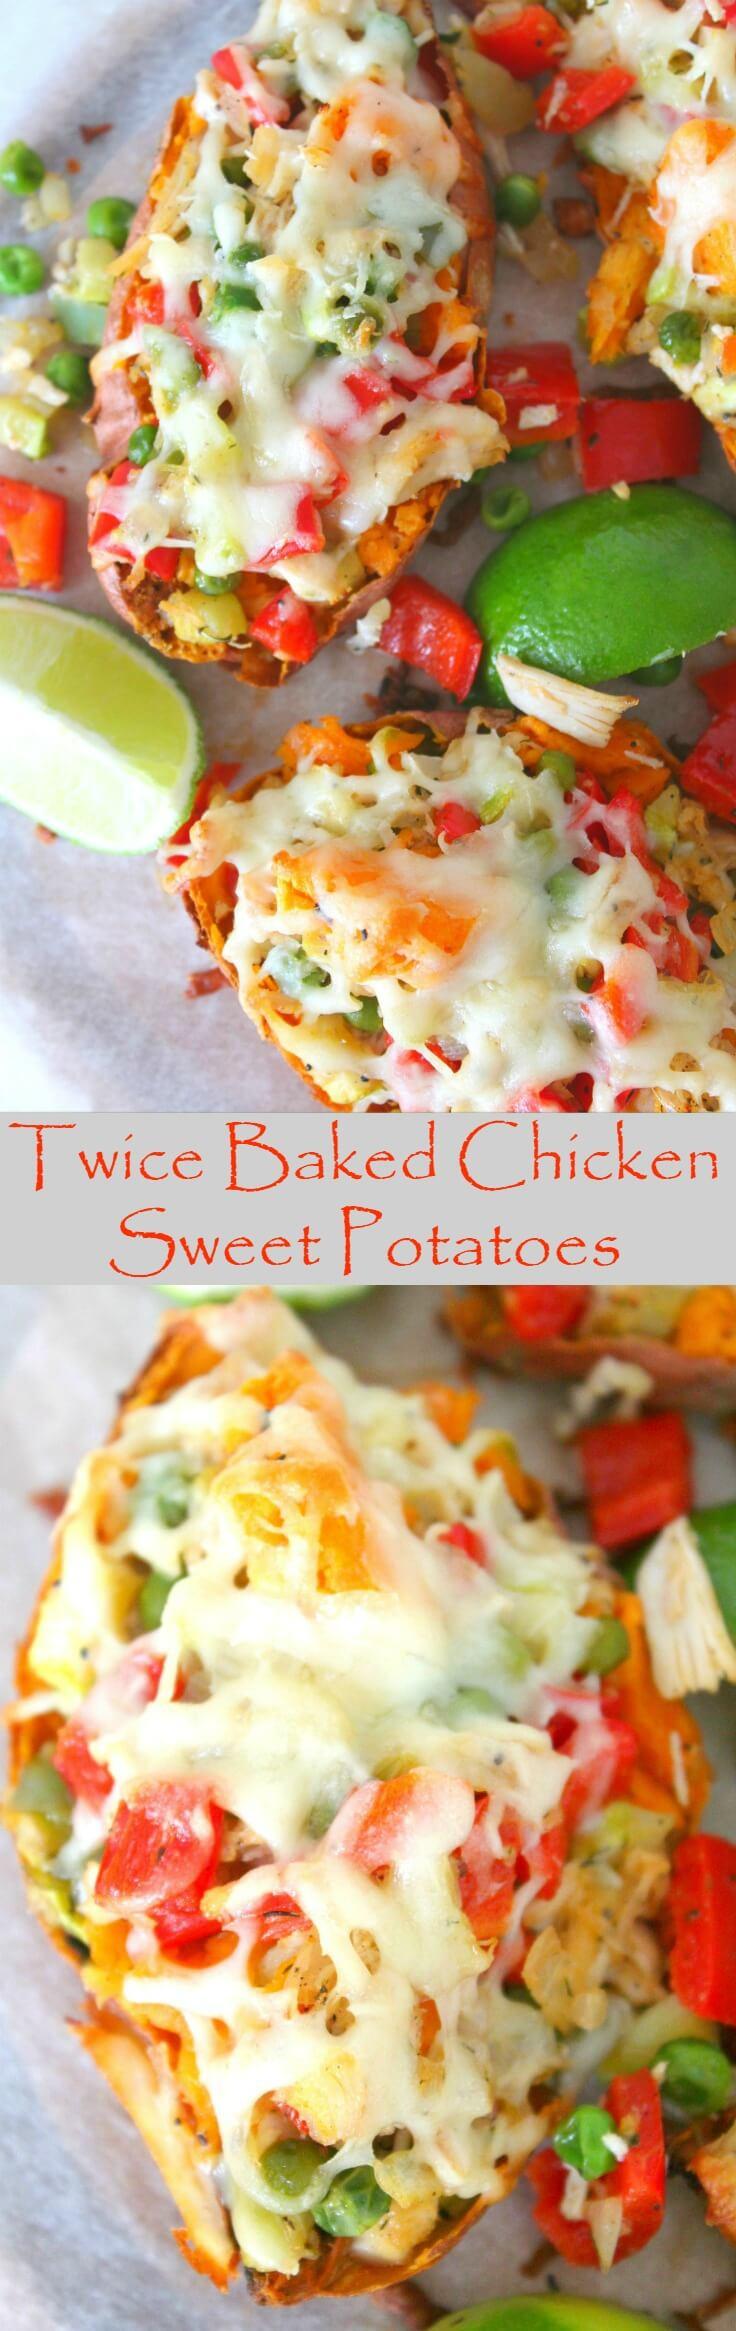 Twice Baked Chicken Sweet Potatoes